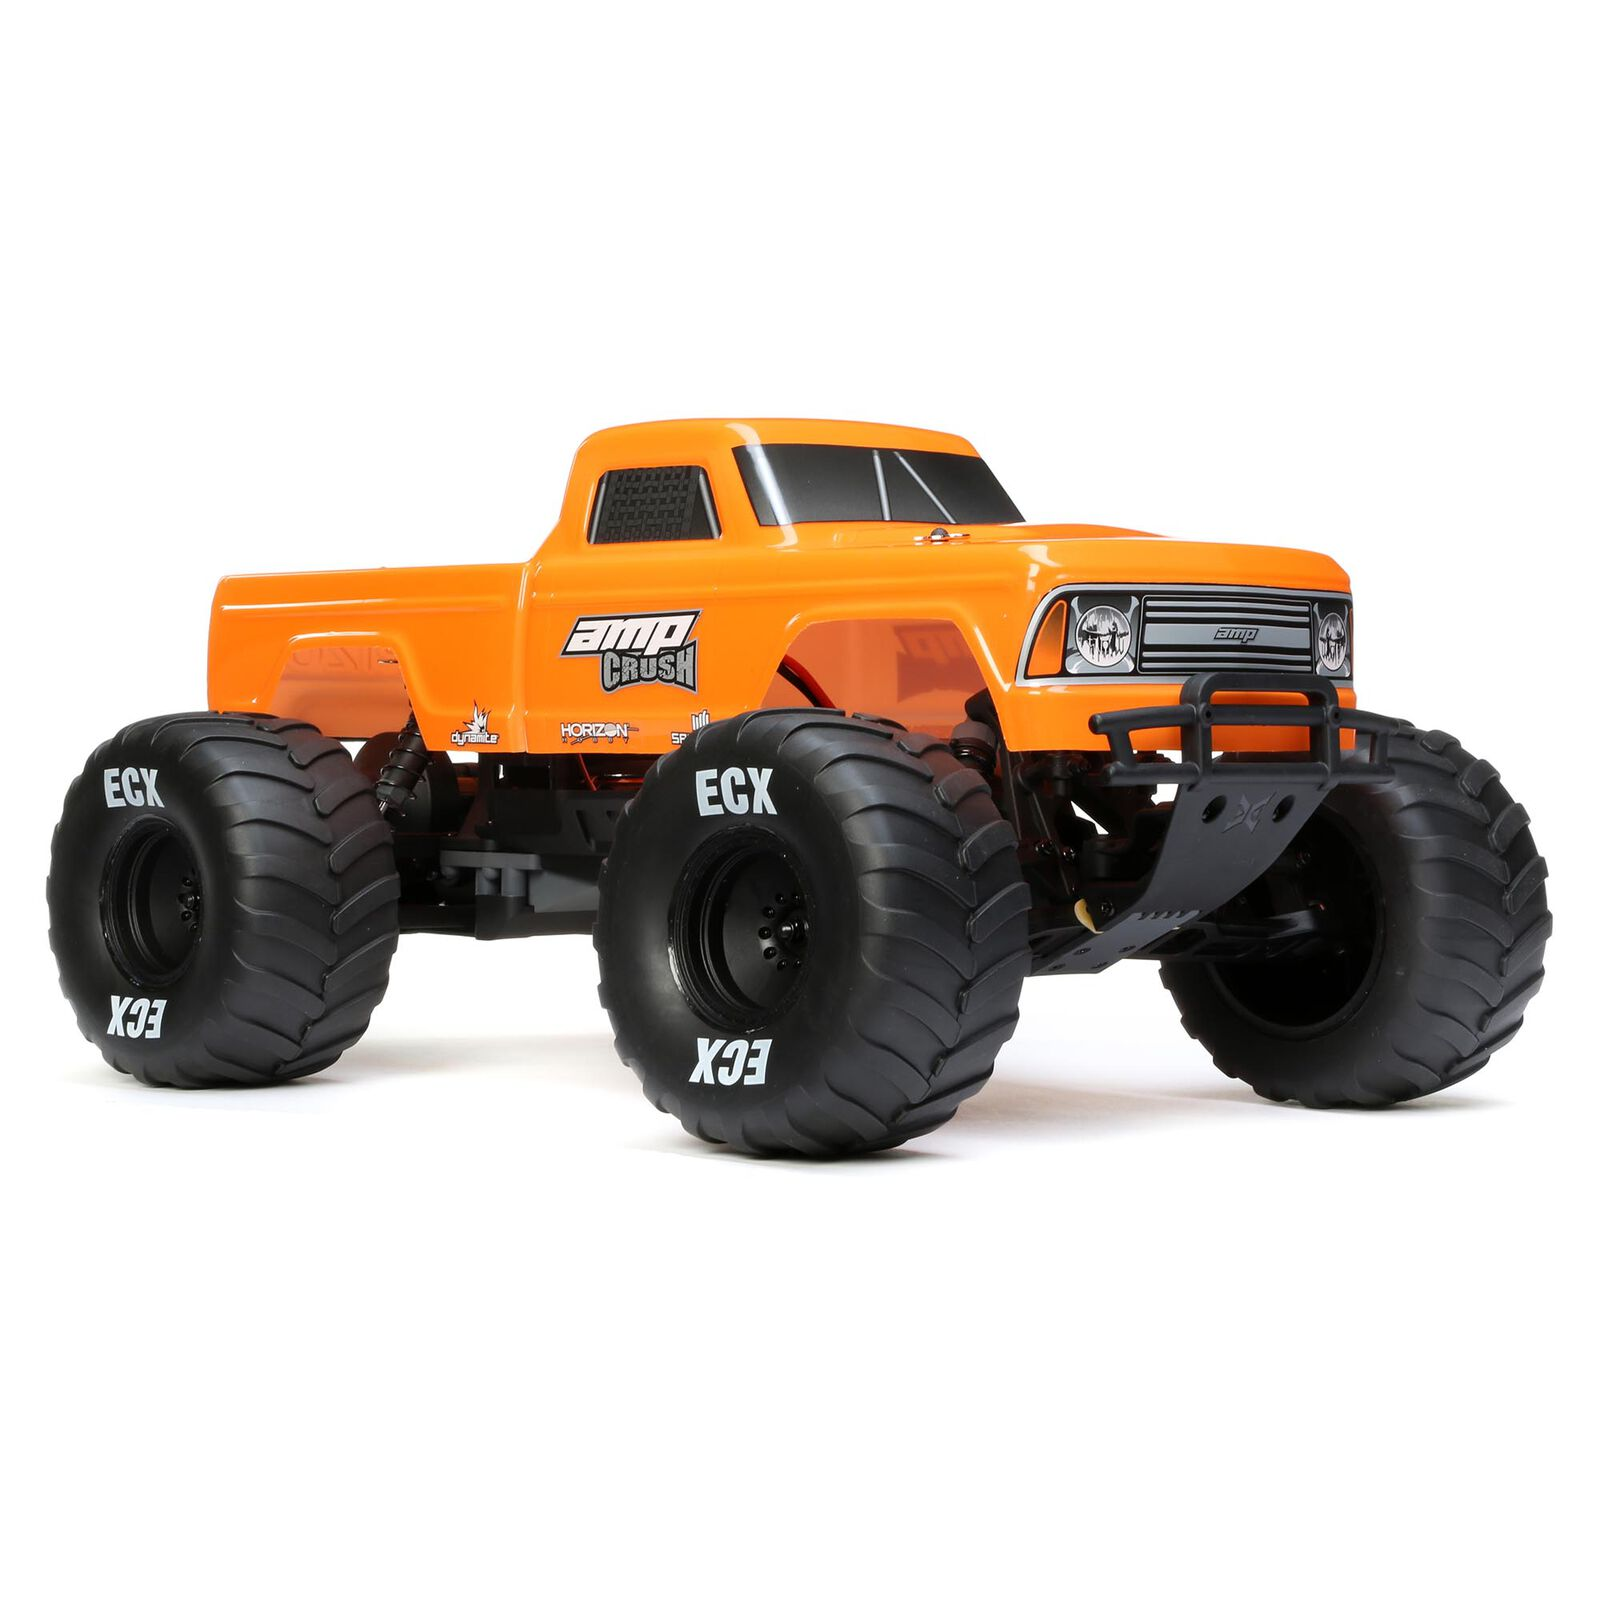 1/10 Amp Crush 2WD Monster Truck Brushed RTR International, Orange